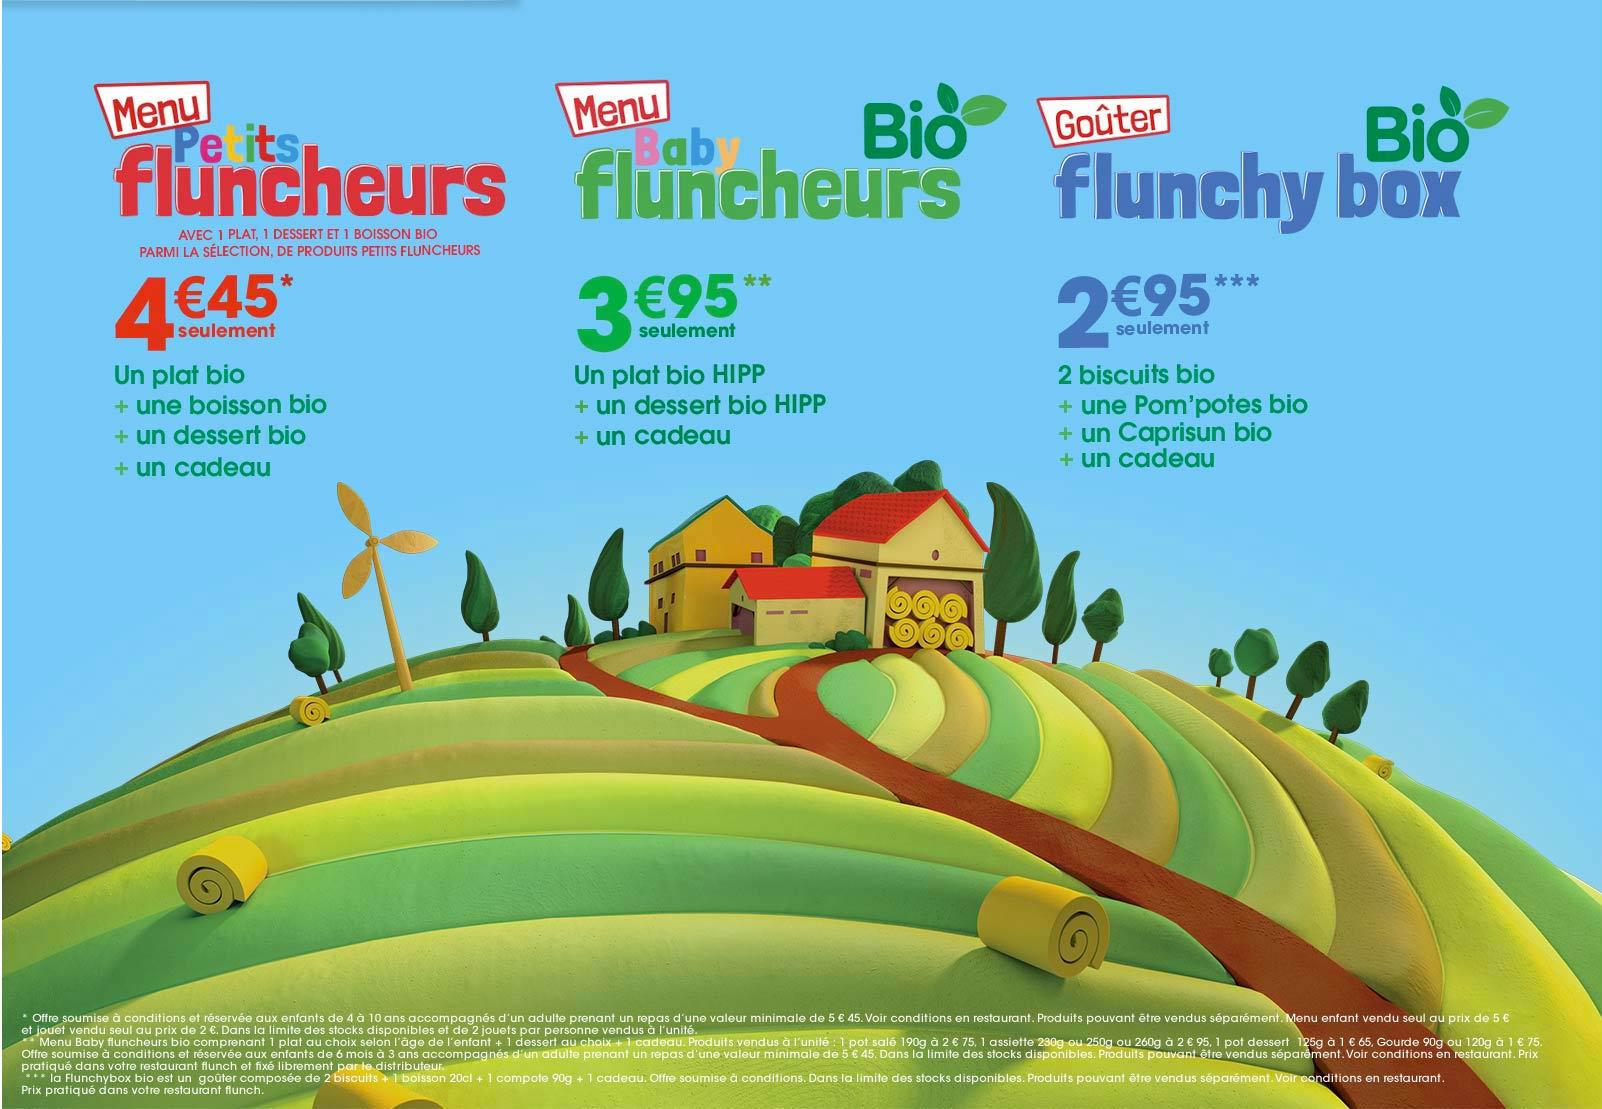 menu enfants bio petits flunheurs baby bio goutêr io